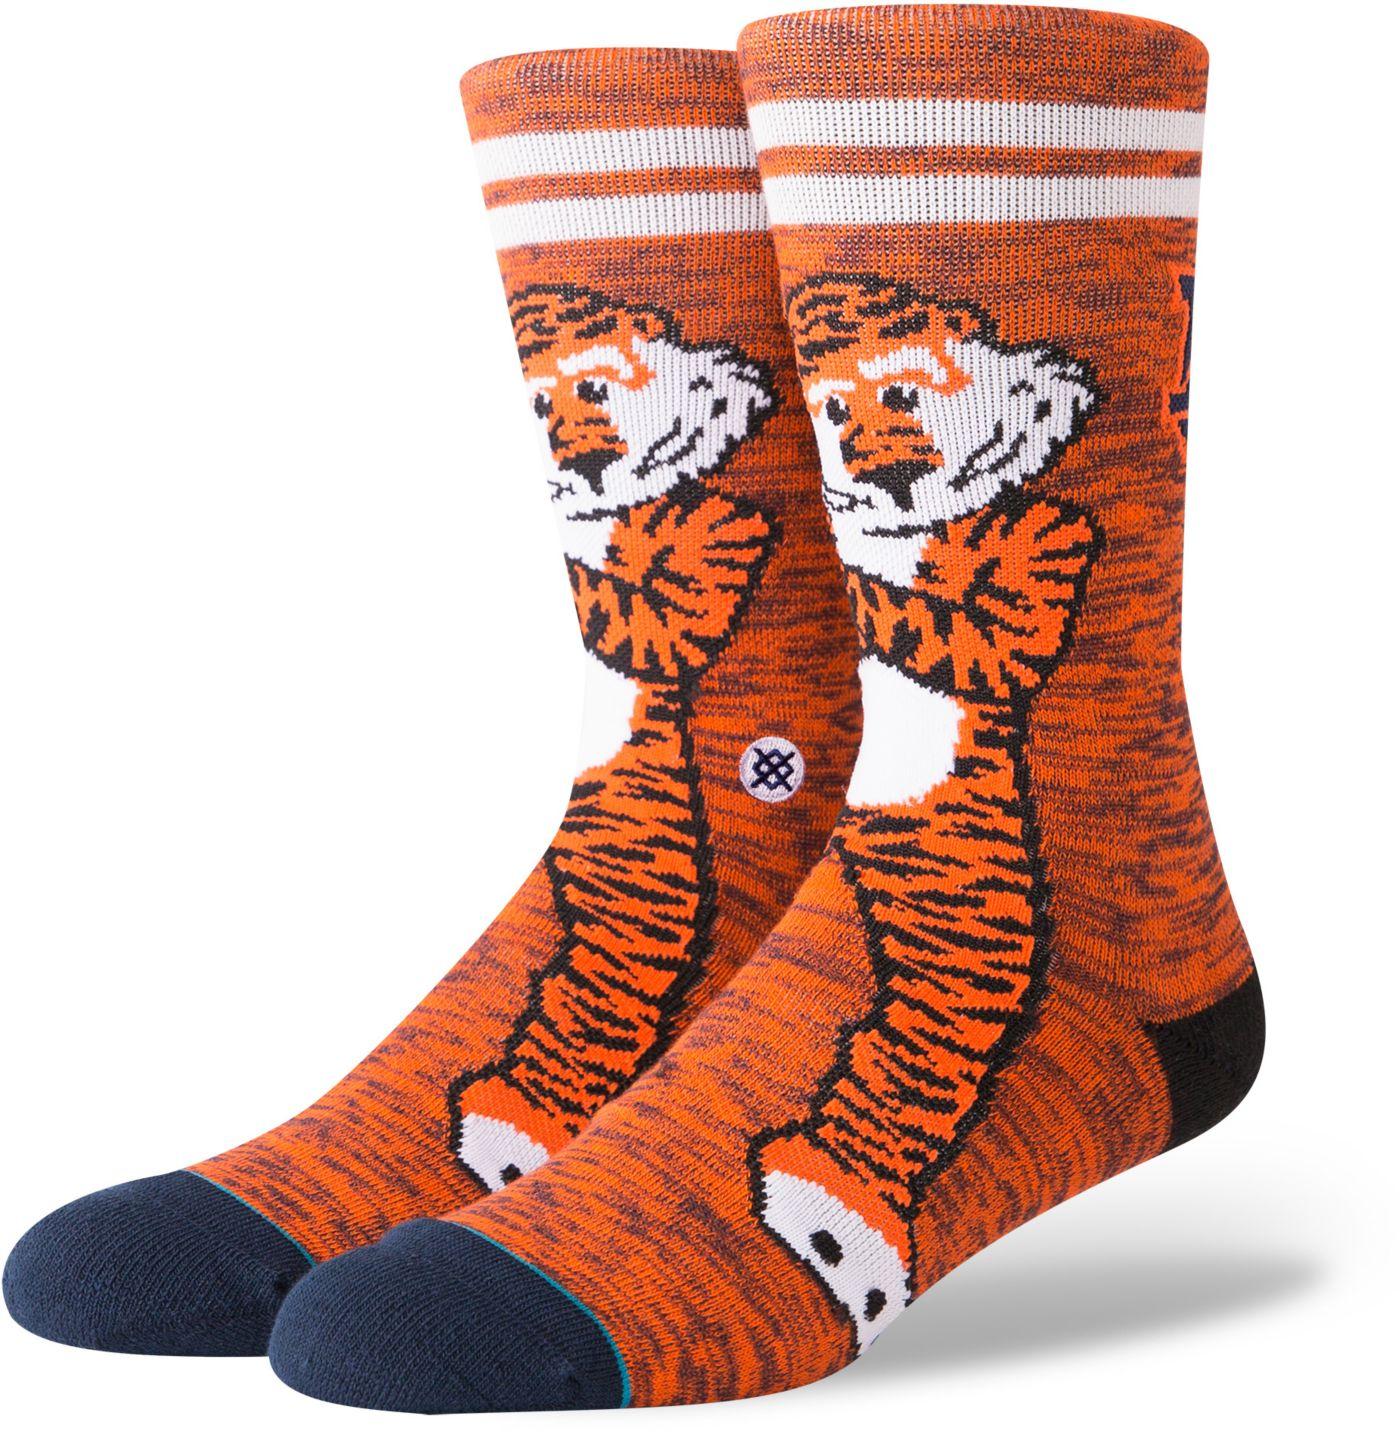 Stance Men's Auburn Tigers Character Crew Socks